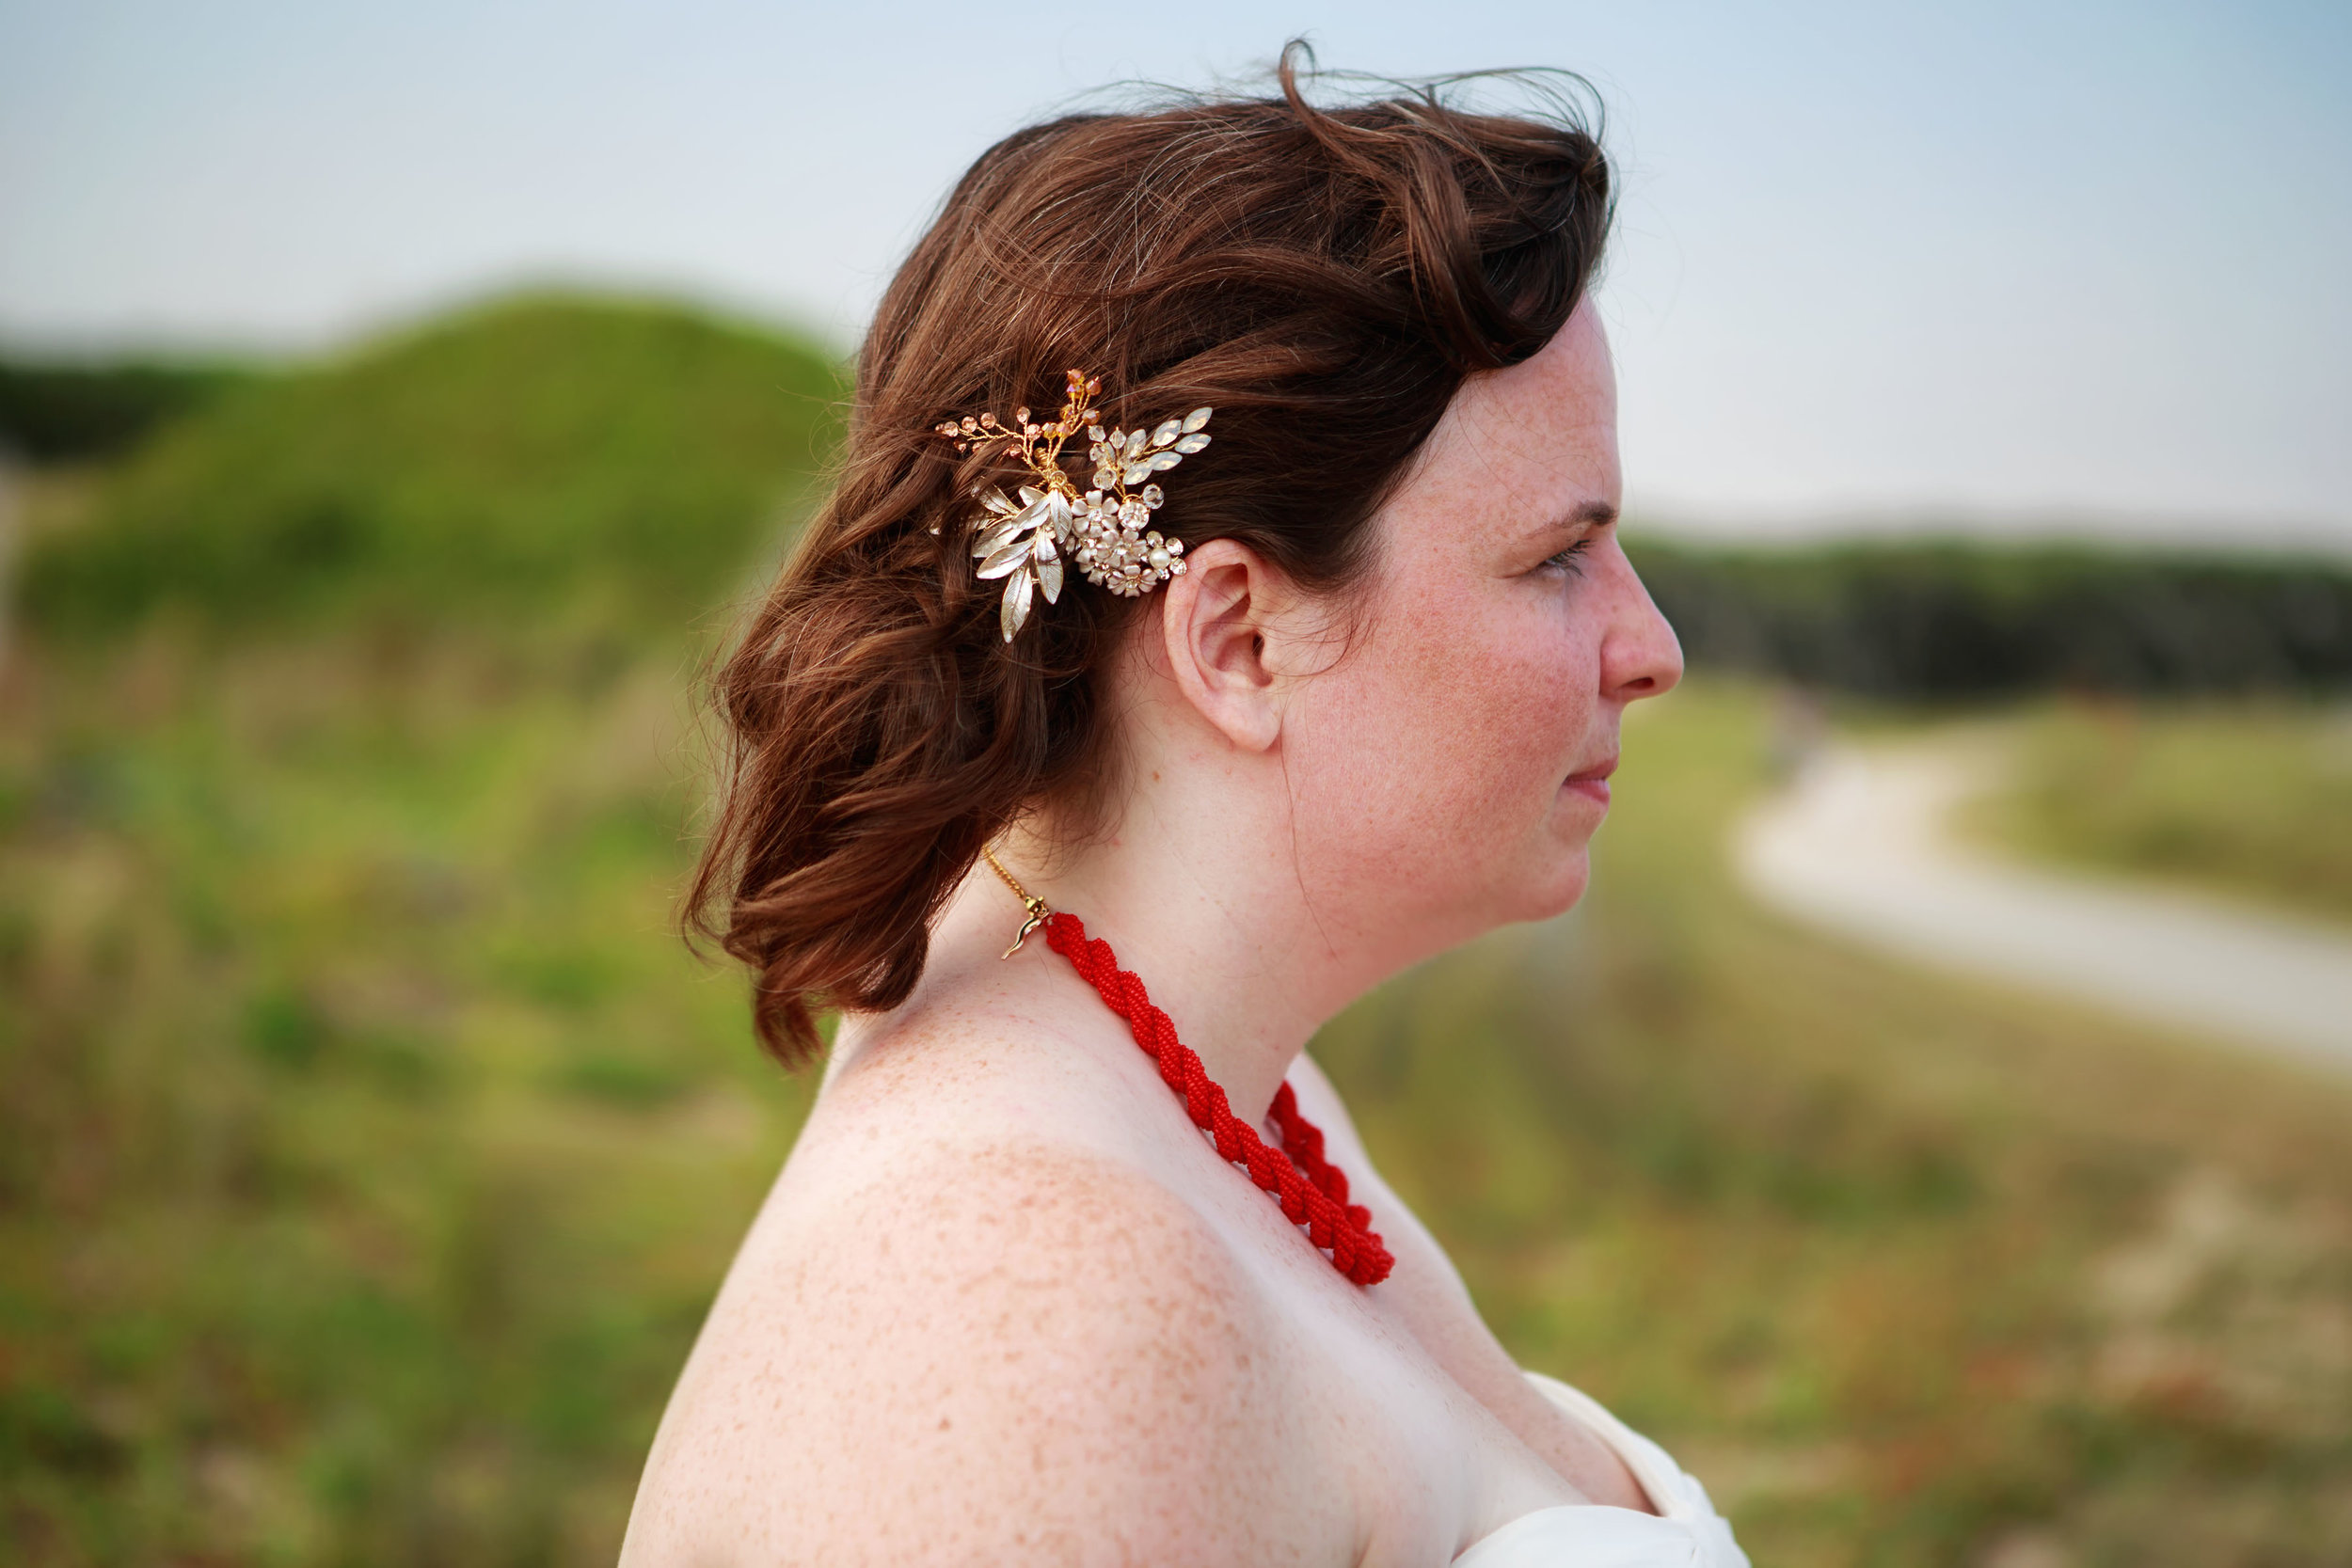 Fort_Fisher_Wedding_Photographer_Tiffany_Abruzzo_81.jpg